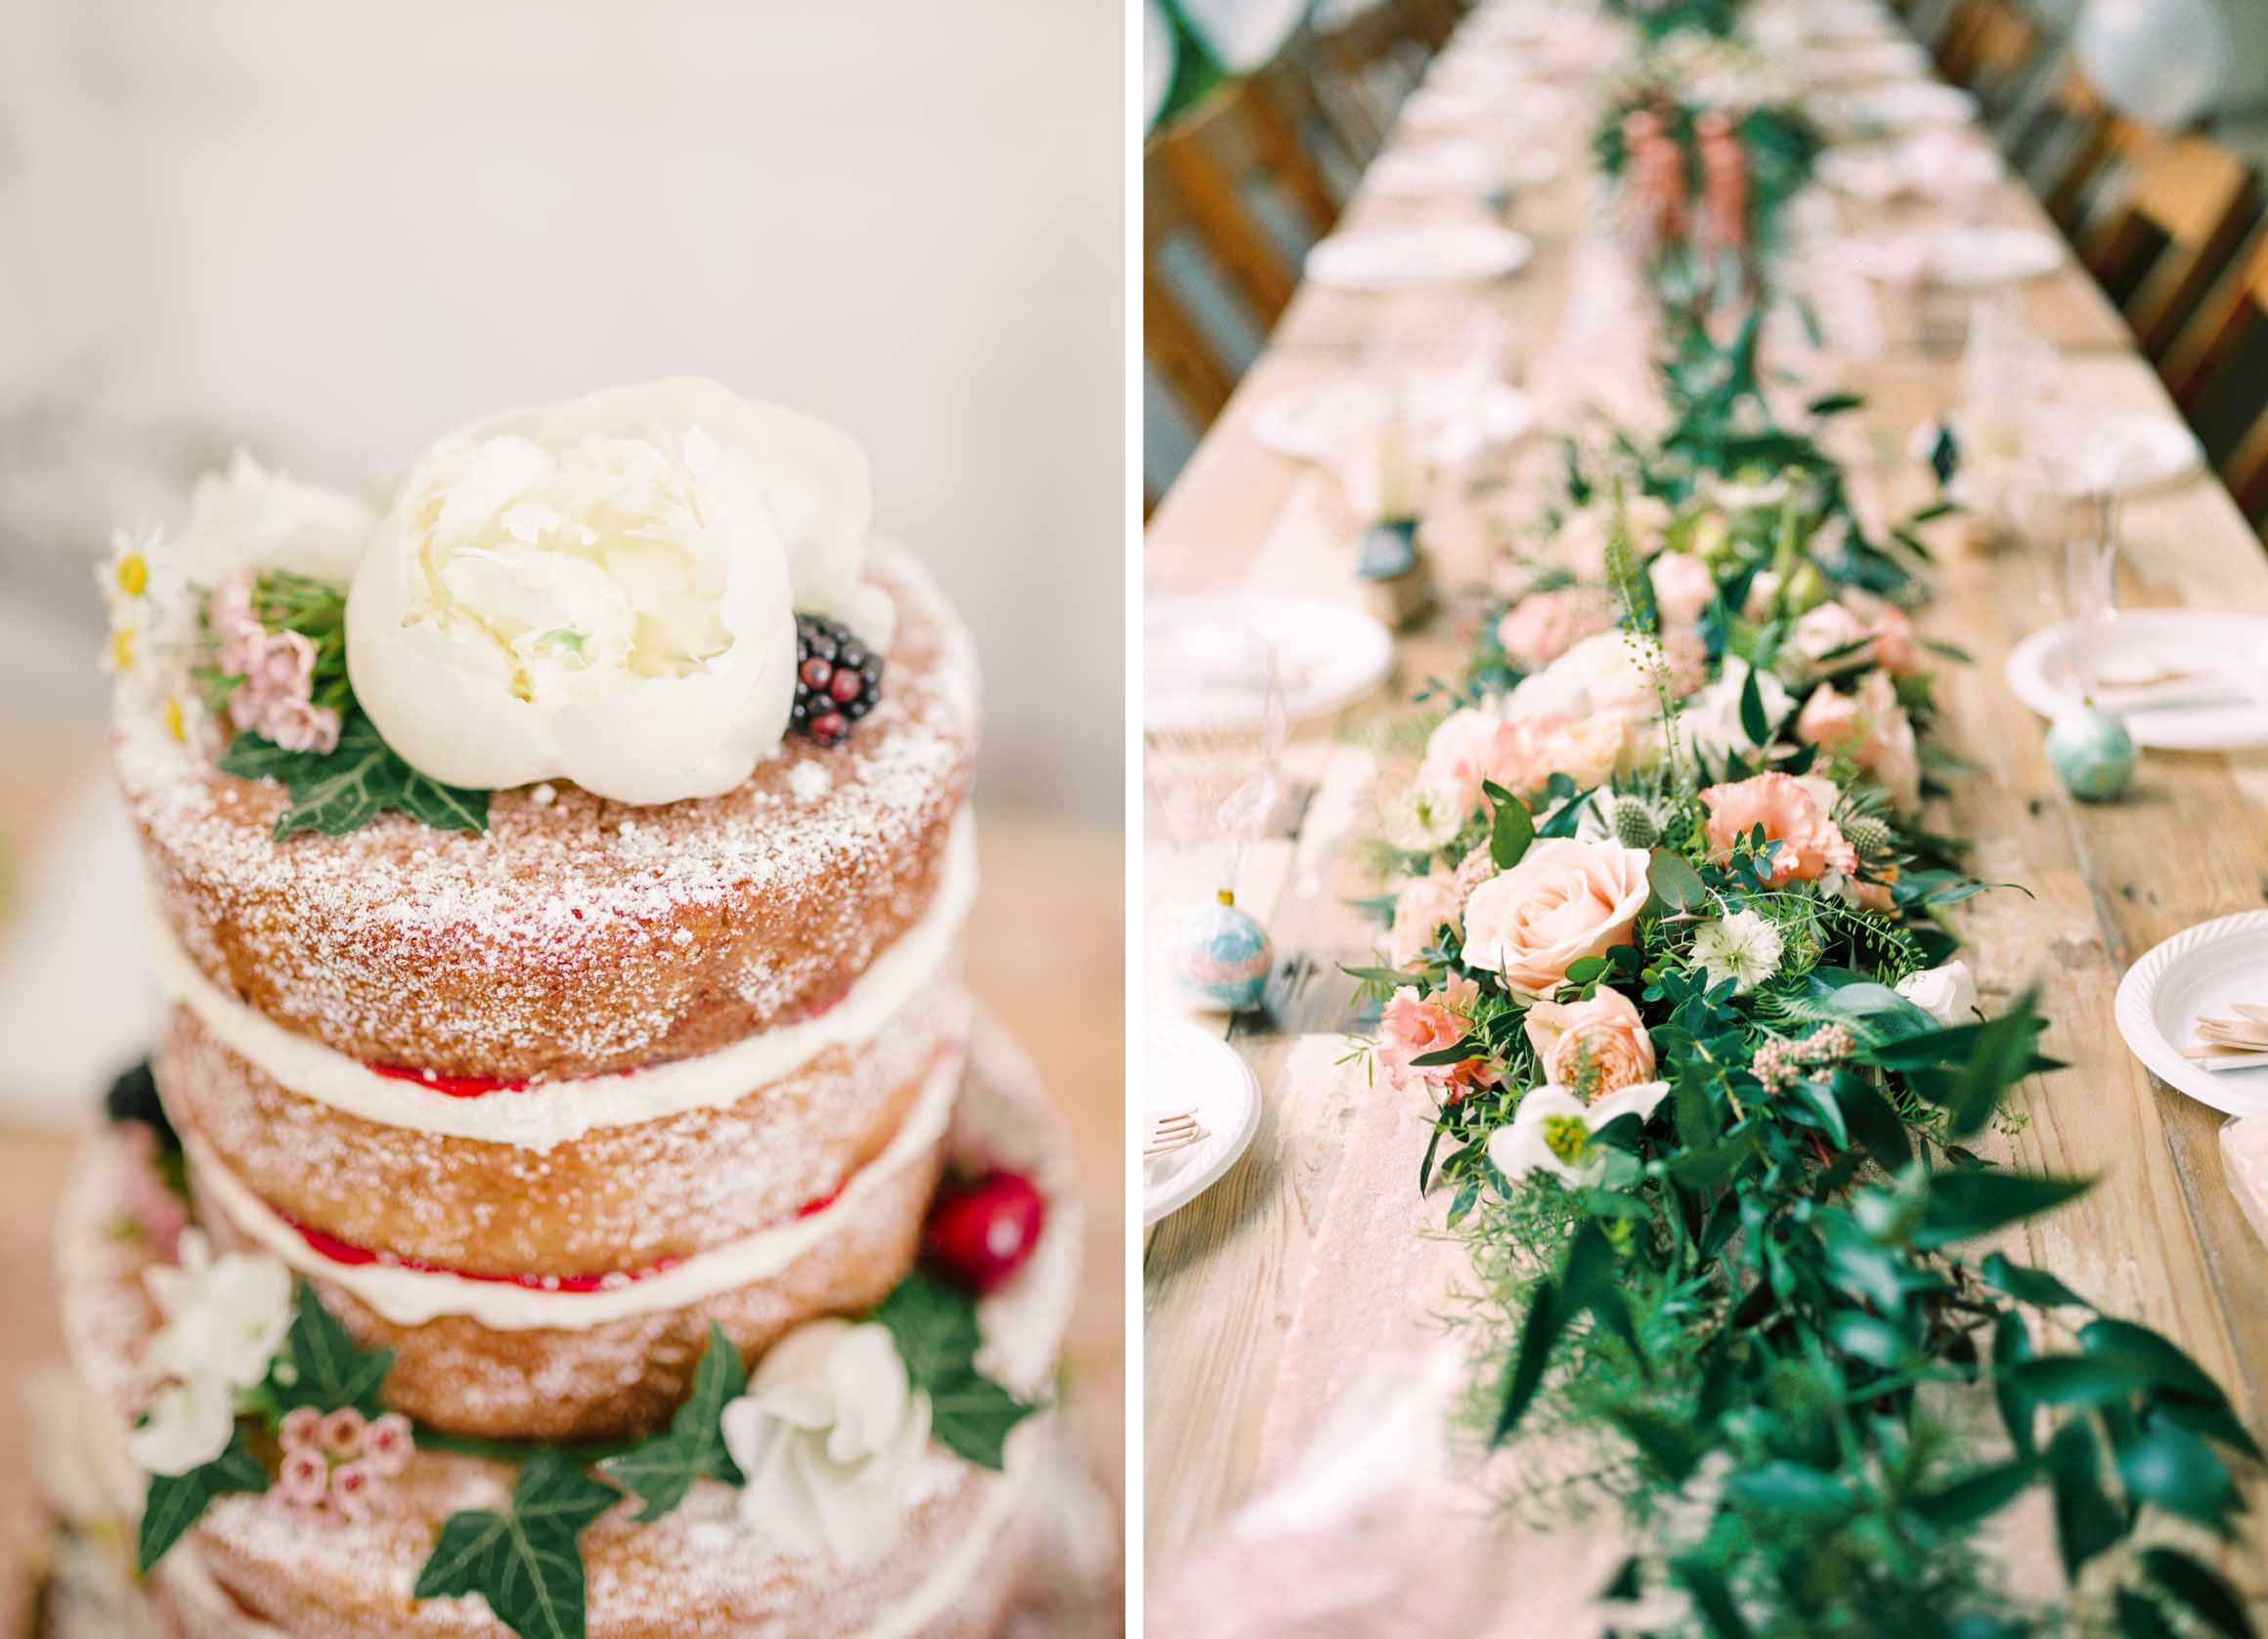 Amy O'Boyle Photography- Destination & UK Fine Art Film Wedding Photographer- London Garden Wedding At Home 8.jpg